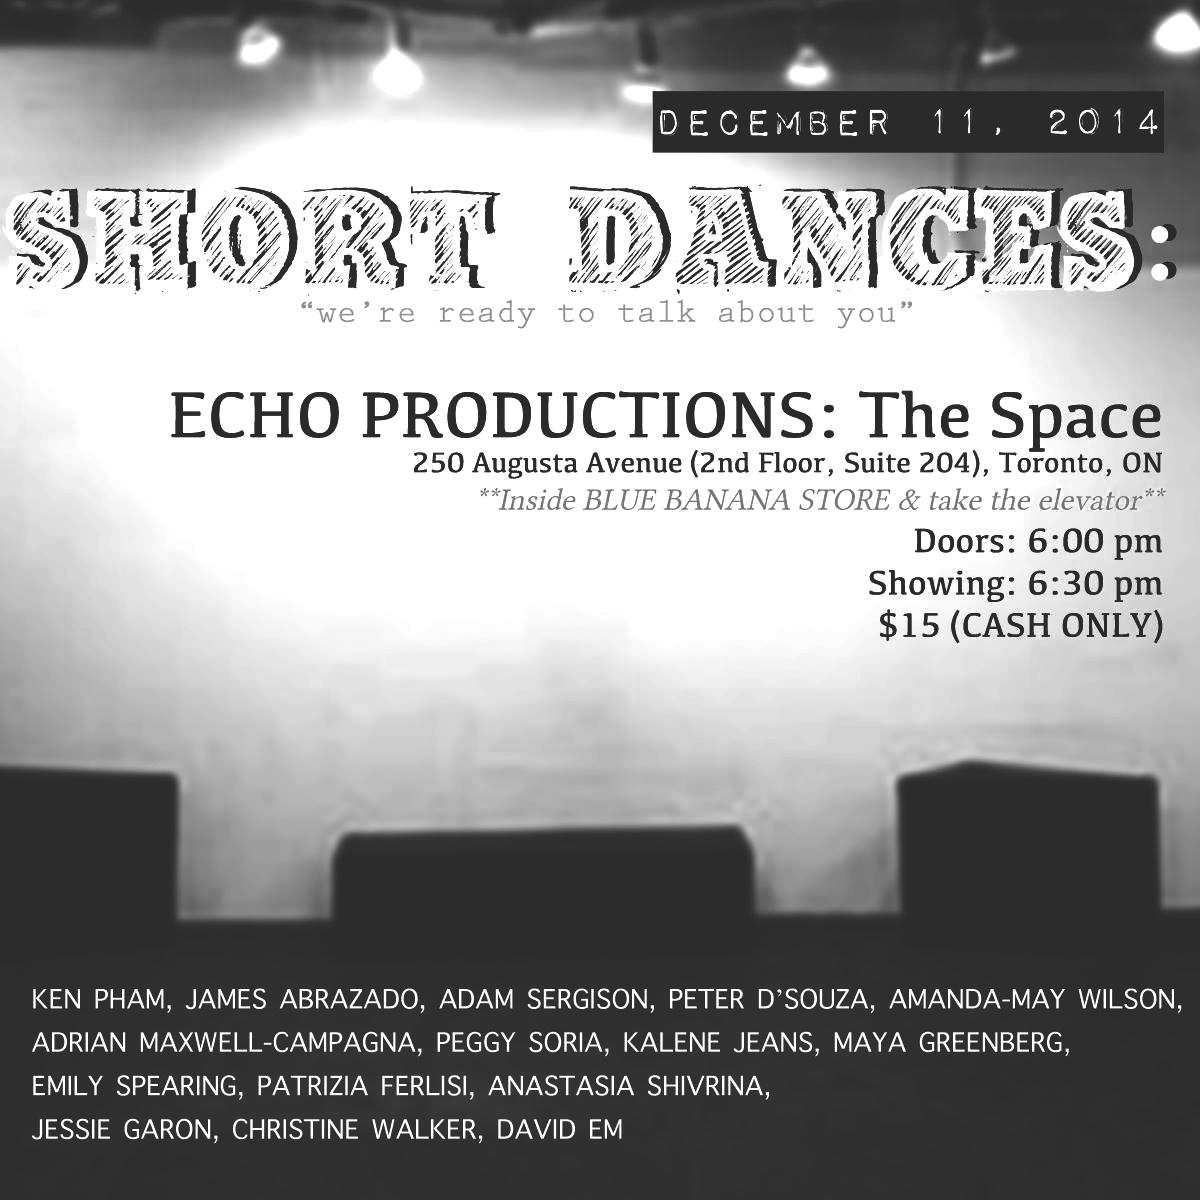 Dec 2014 - The Space